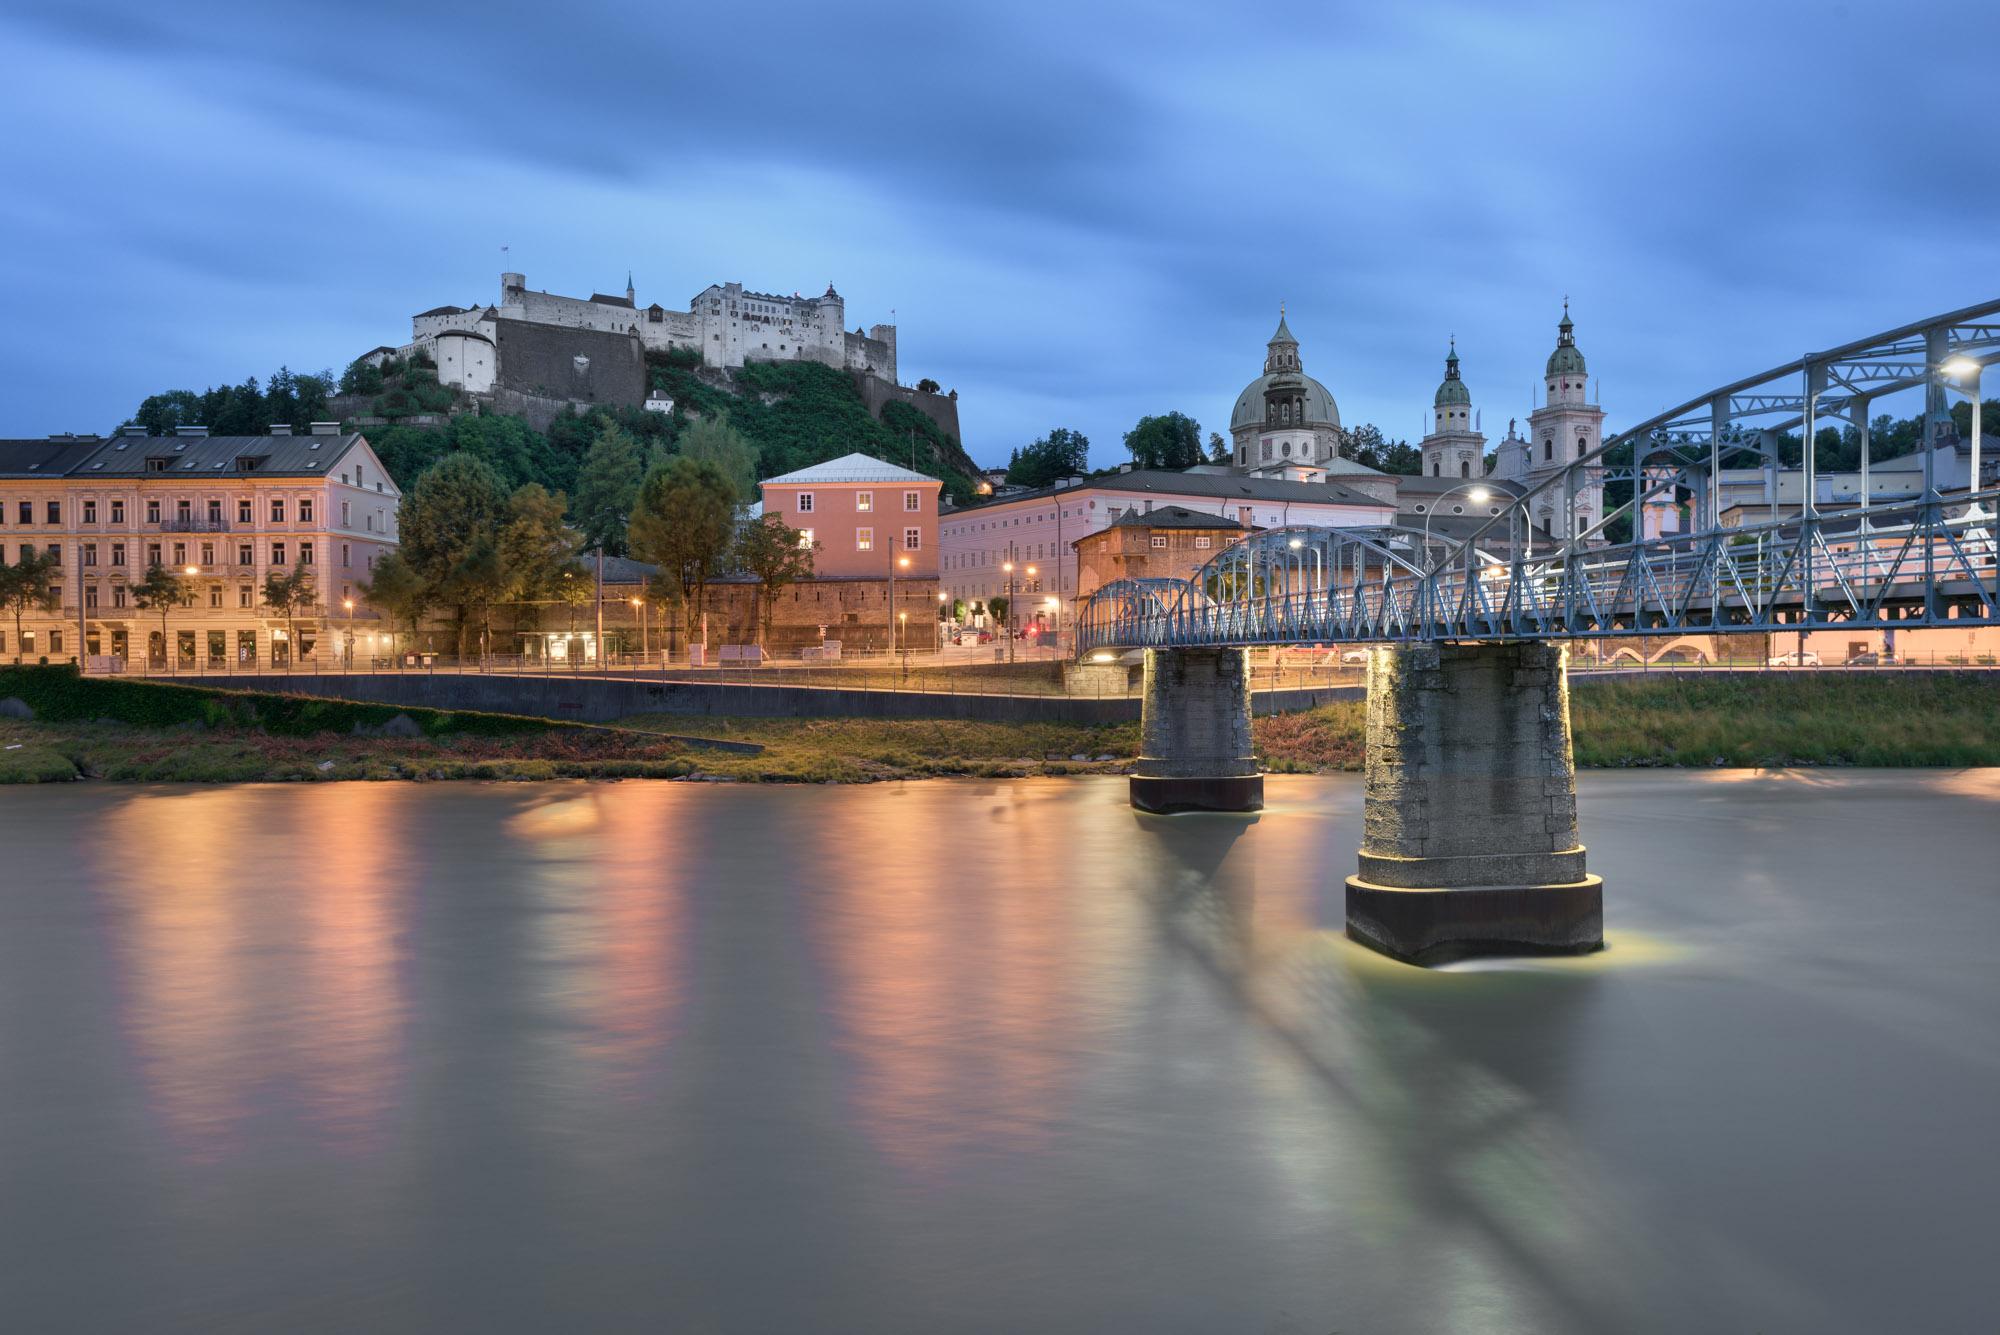 Mozart Bridge in the Morning, Salzburg, Austria